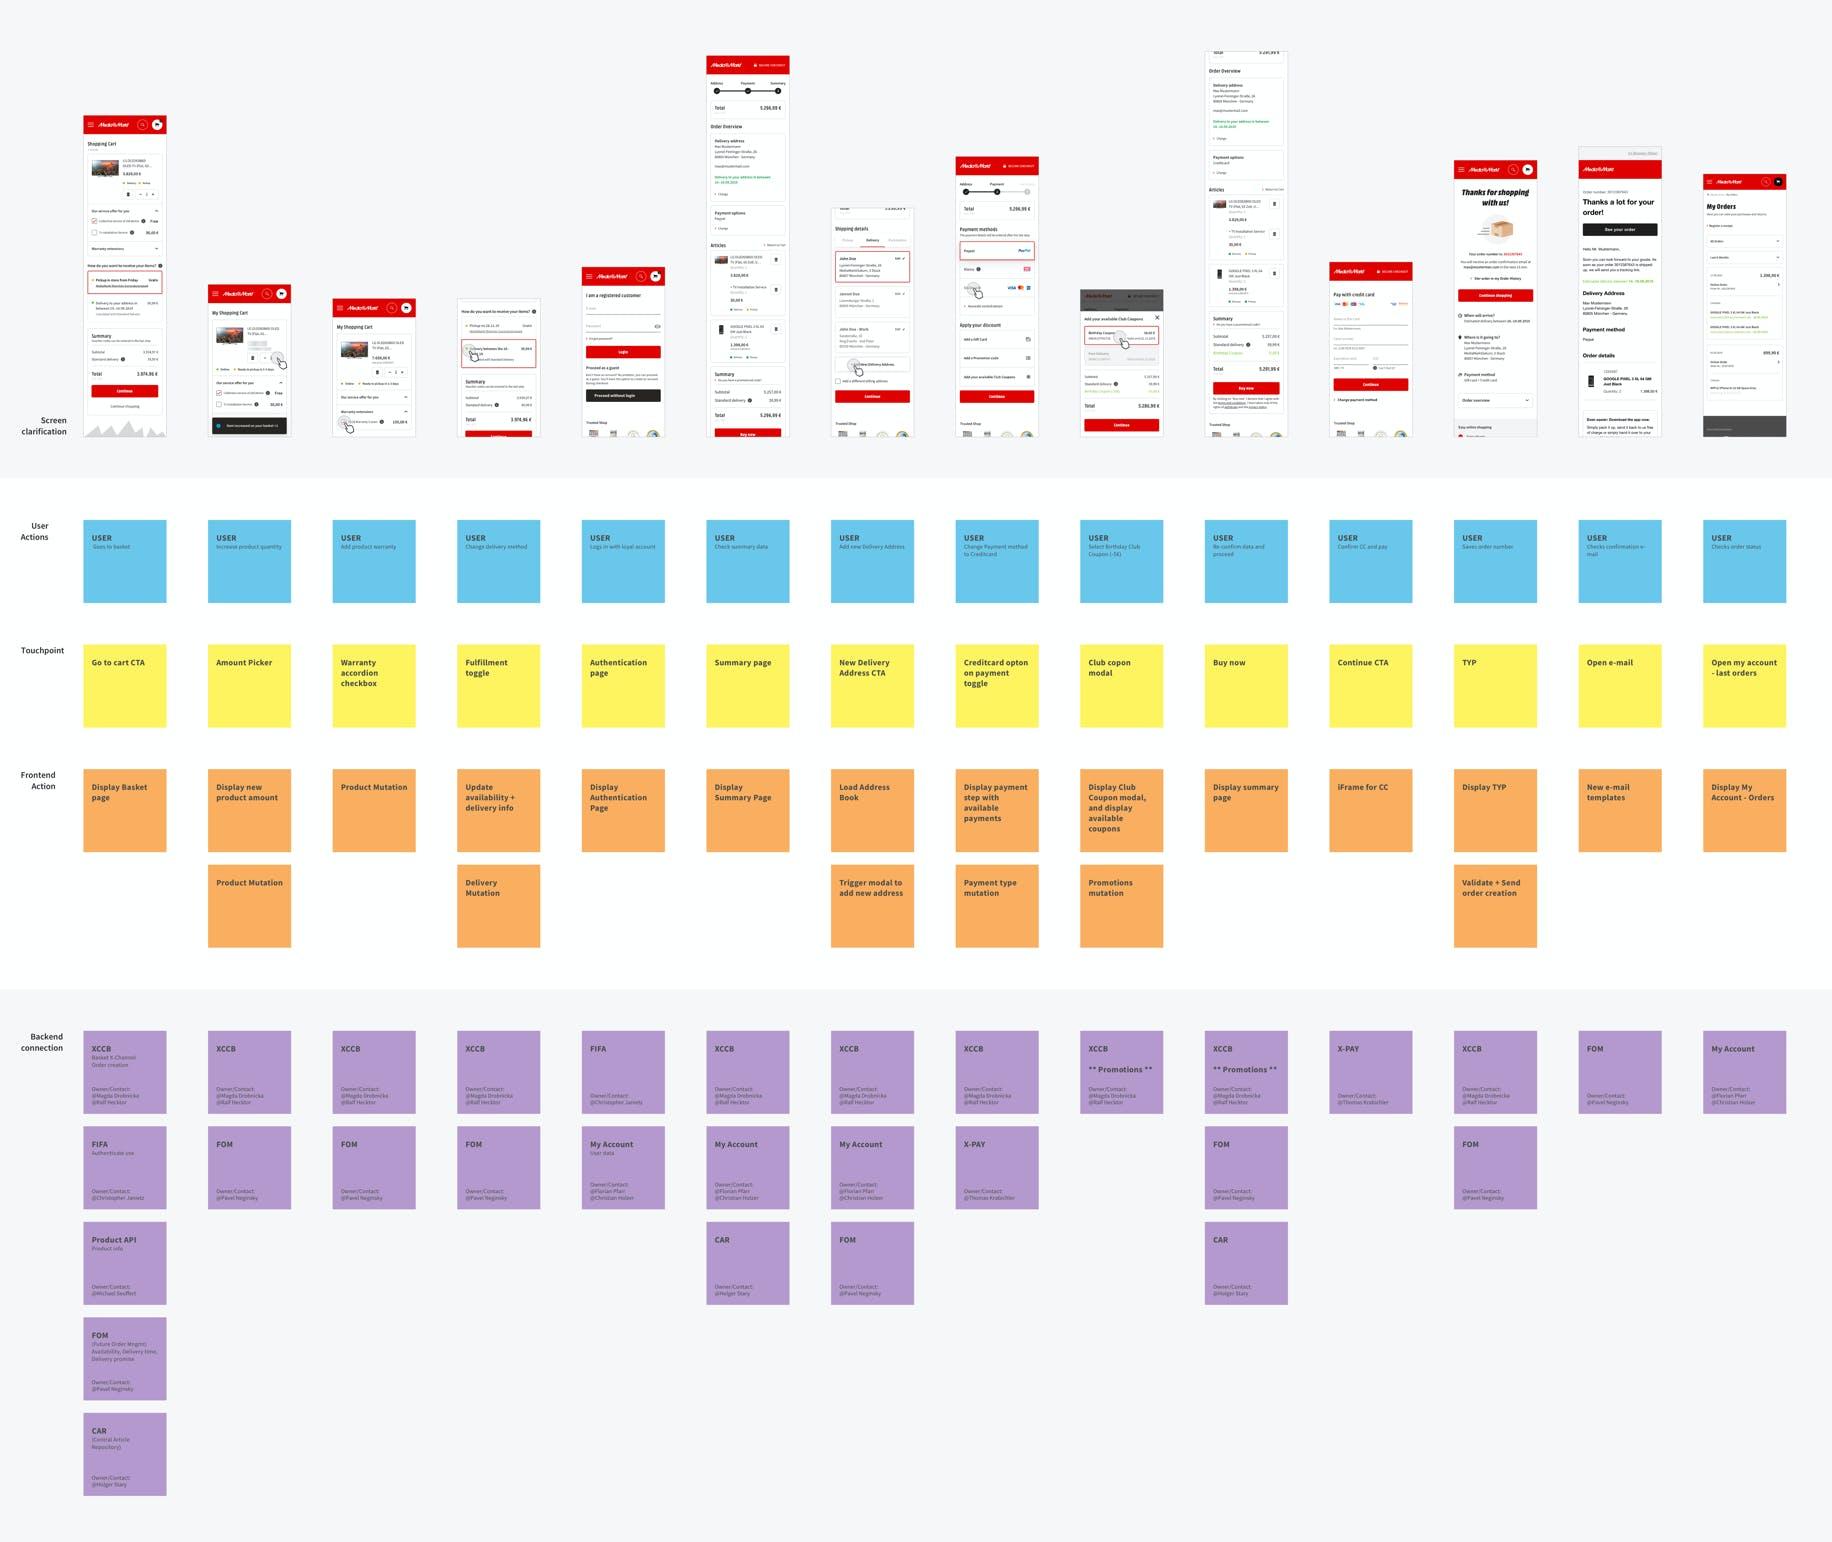 Blueprint of MediaMarkt Checkout experience by Metakitrina